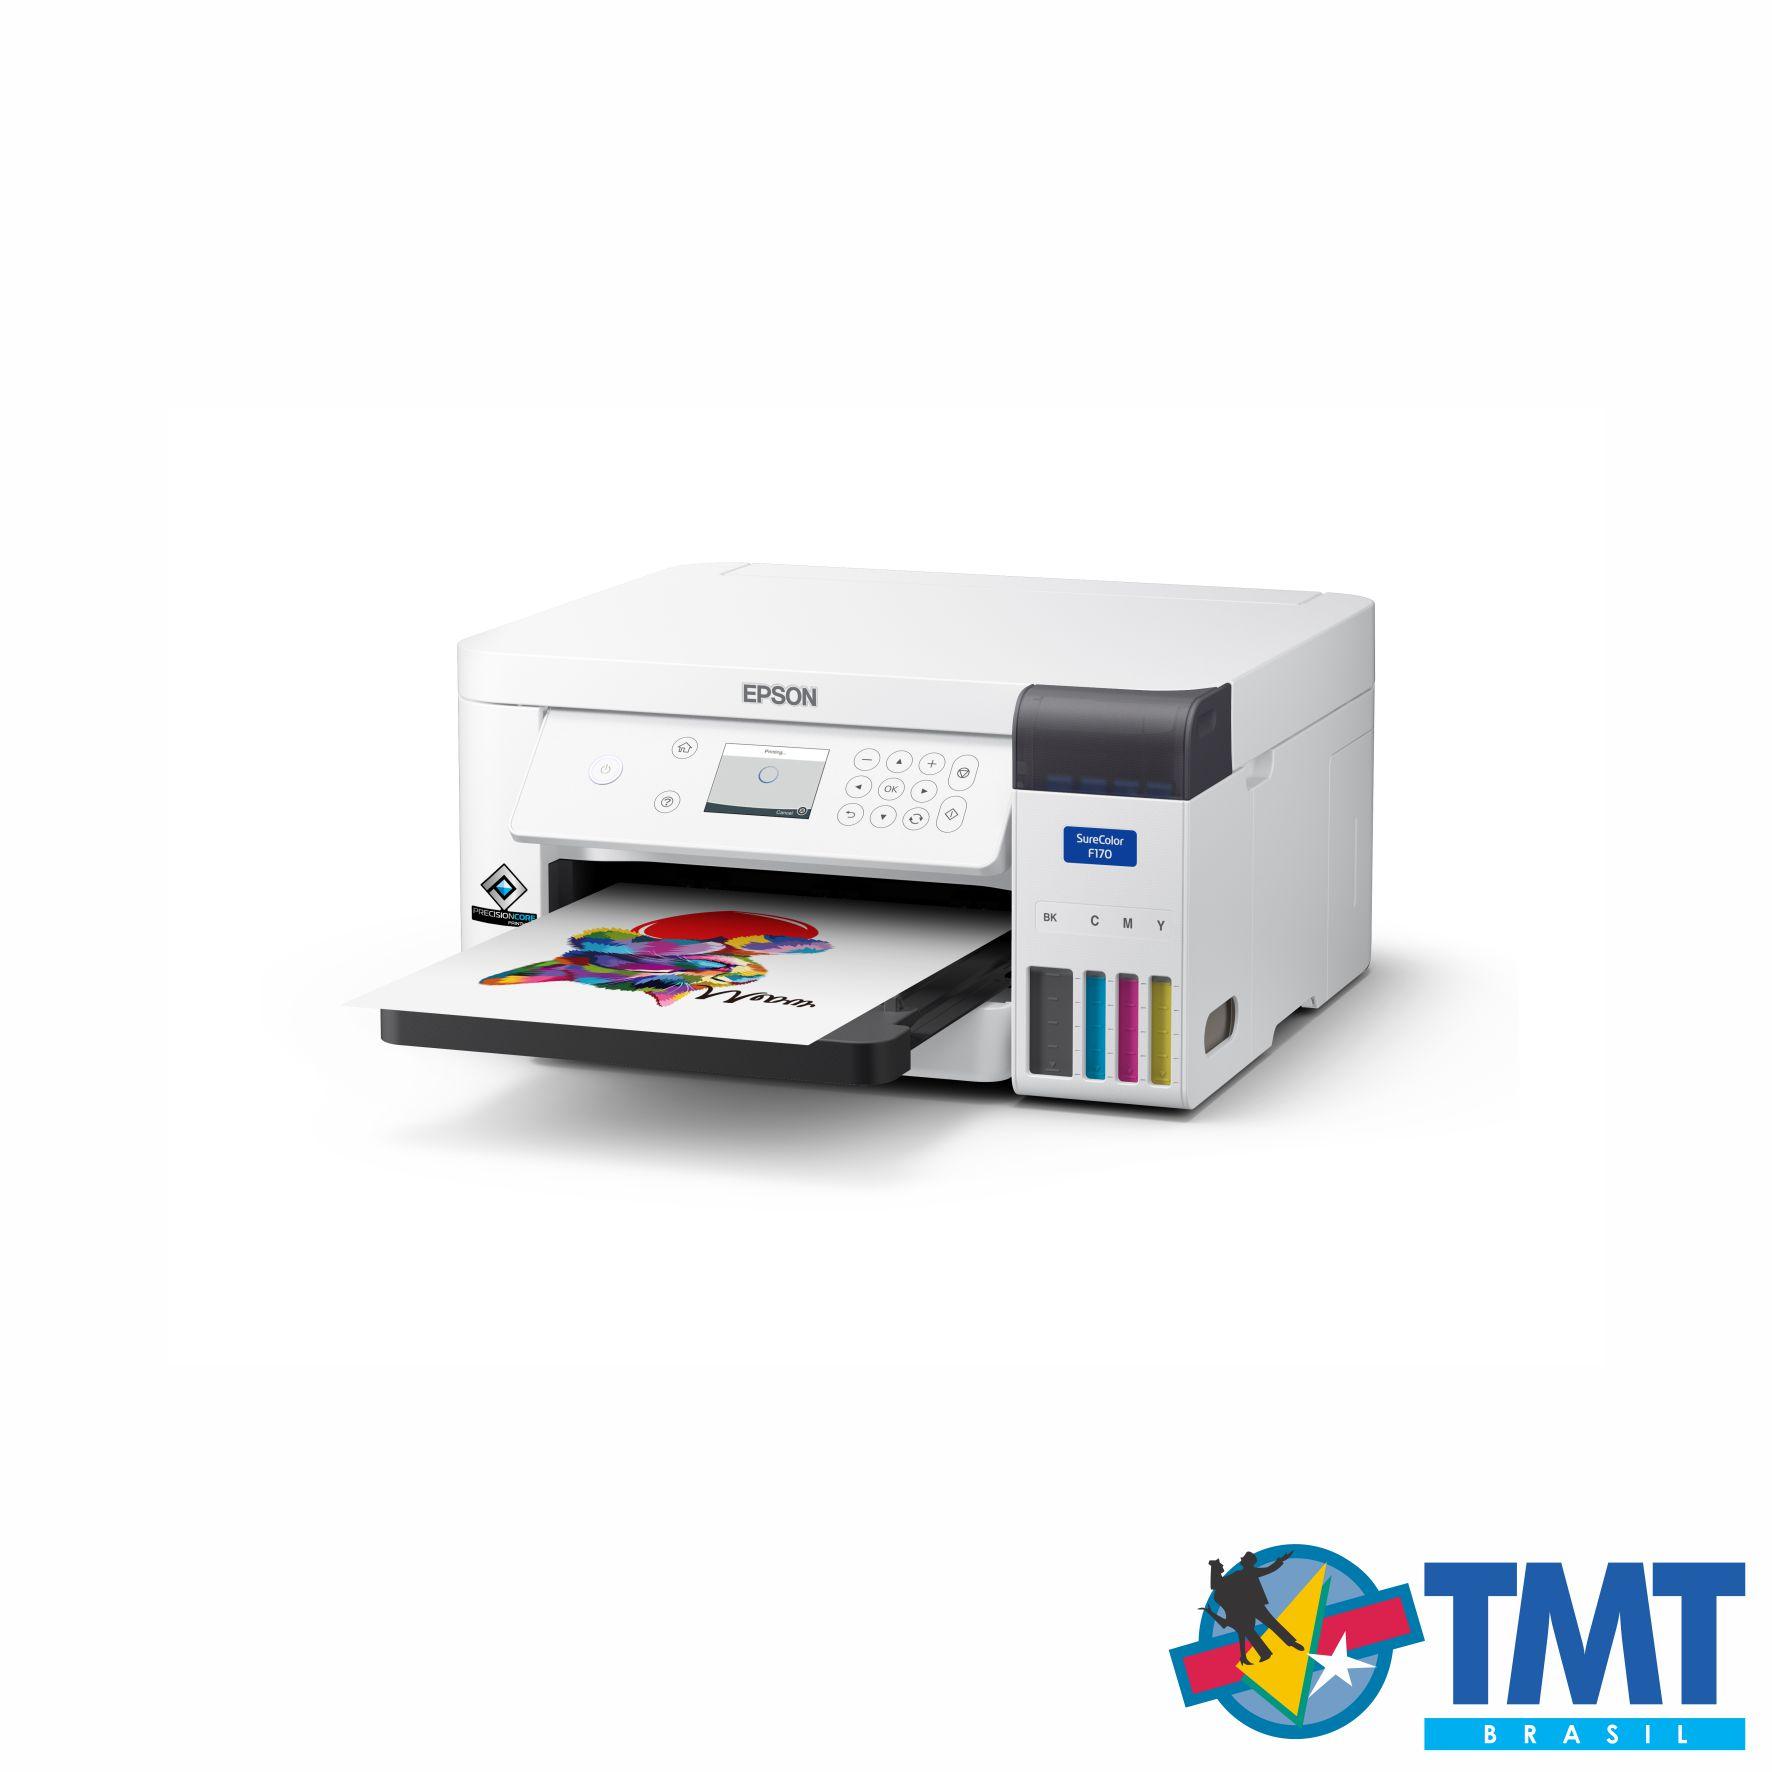 Impressora Sublimática A4 Epson SureColor F170 - A4 - PRONTA ENTREGA